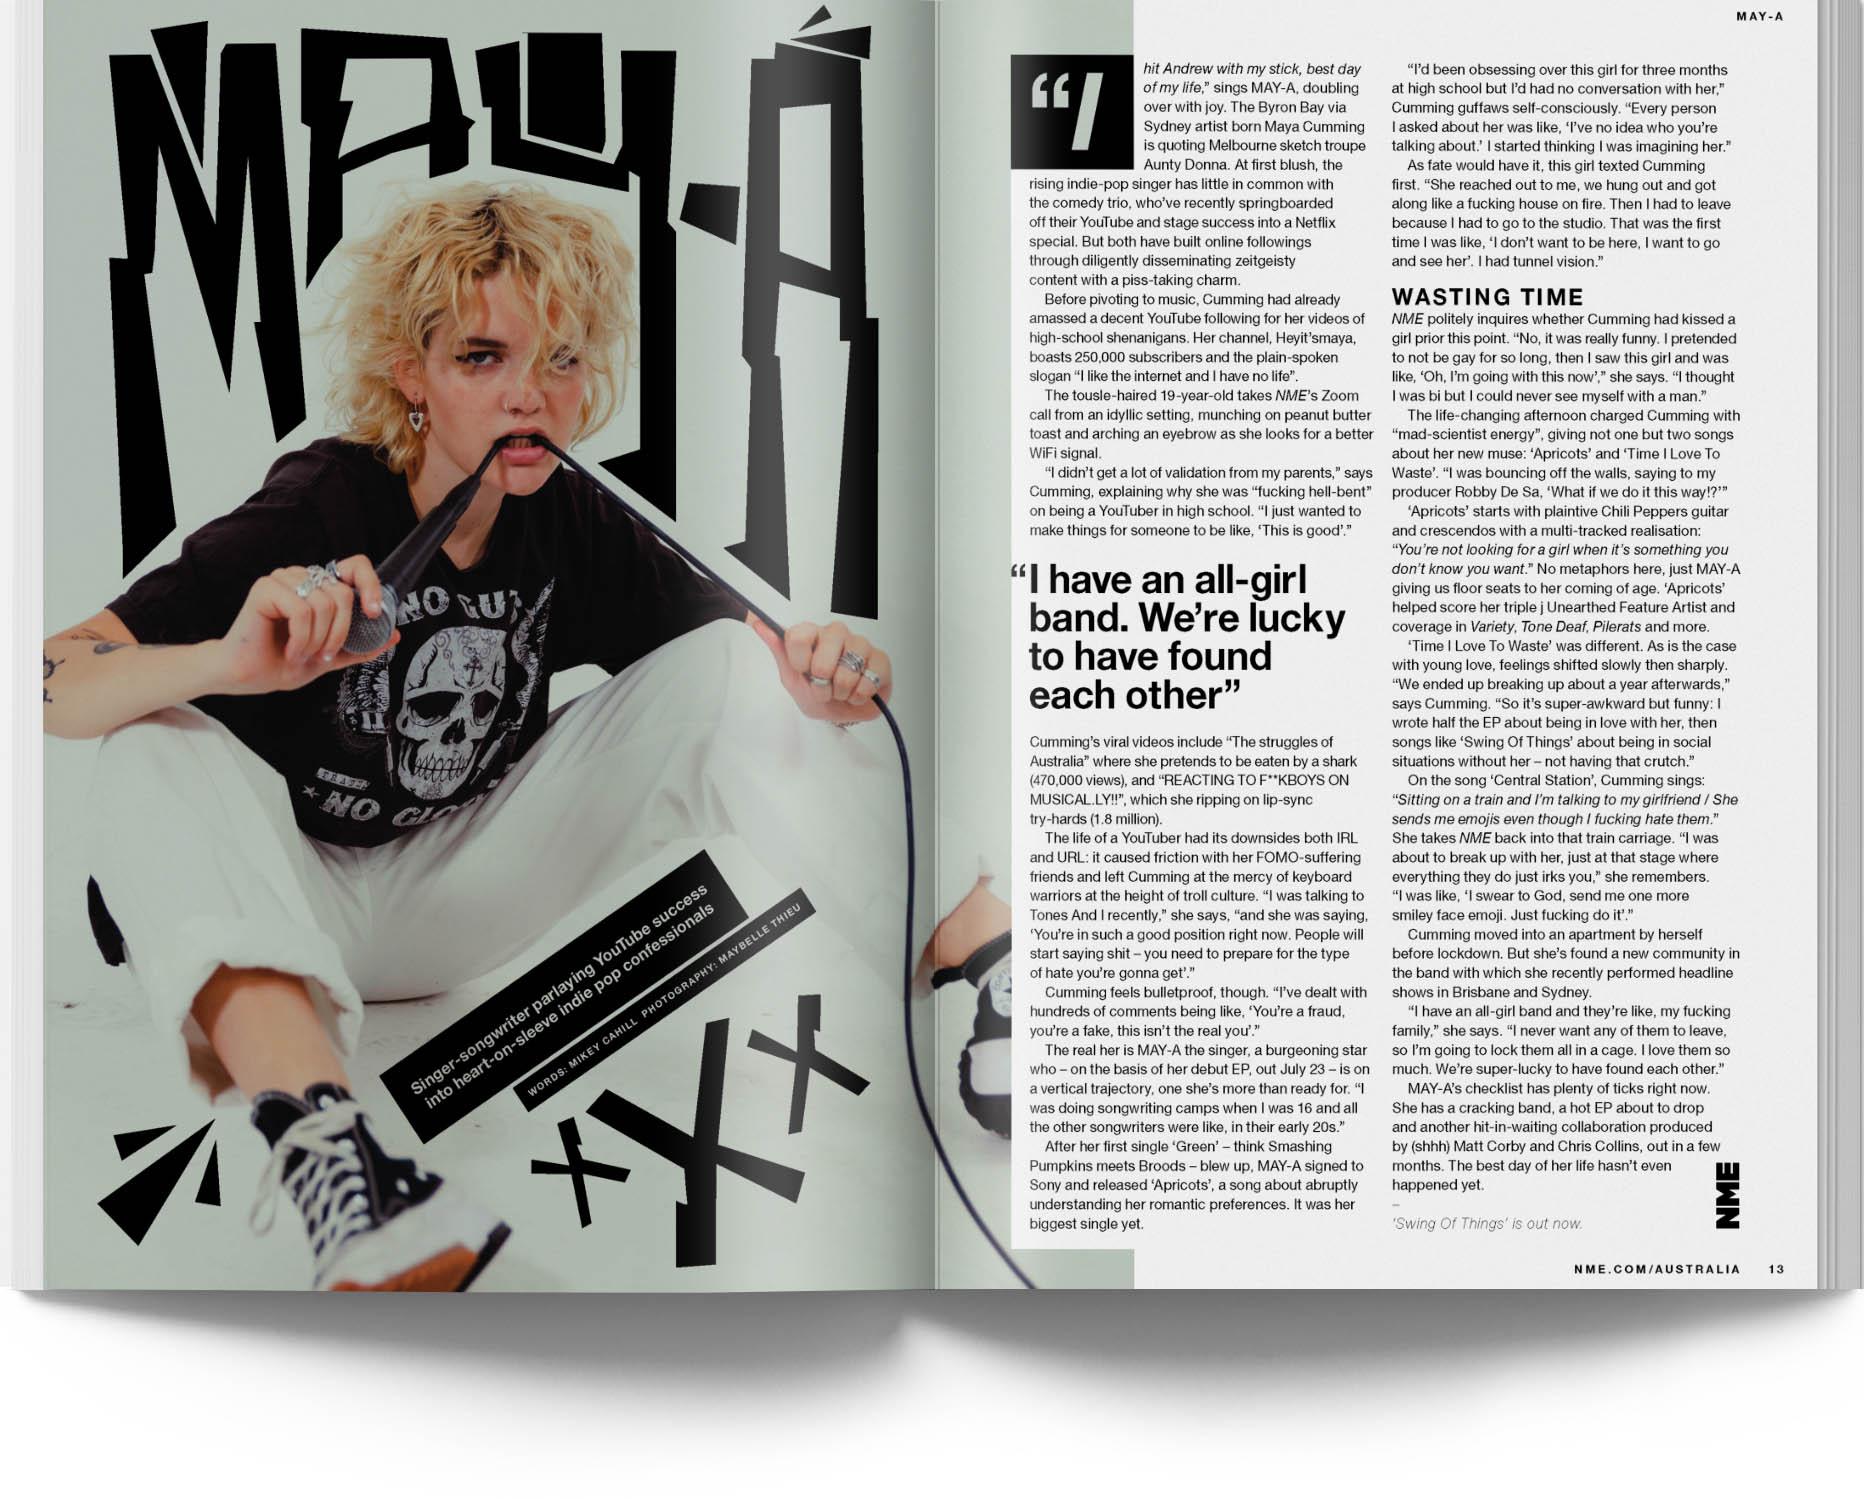 NME Australia Magazine Issue 18